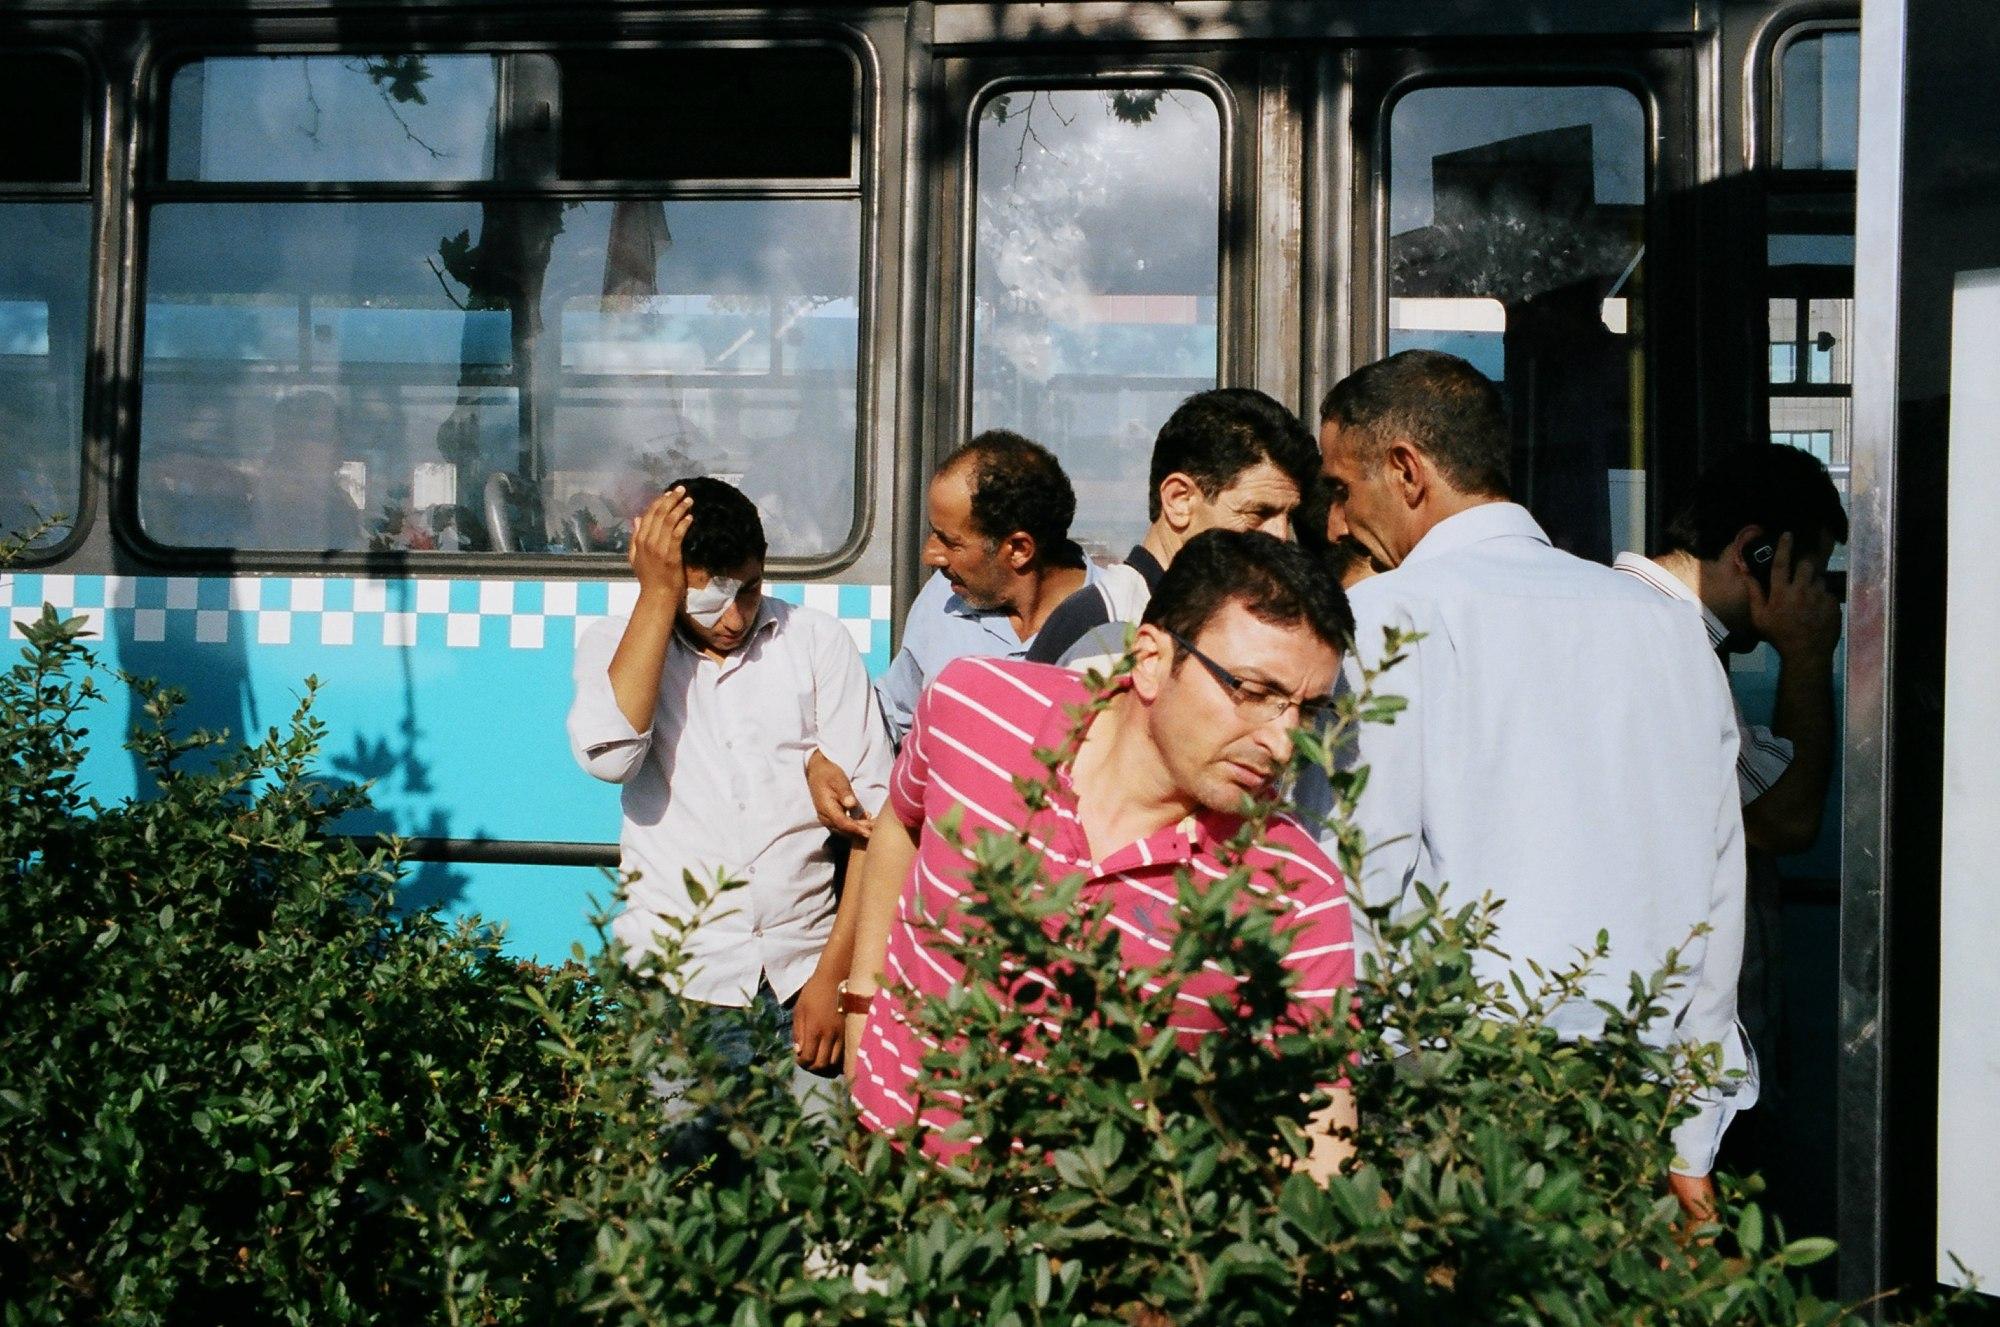 Istanbul movement.